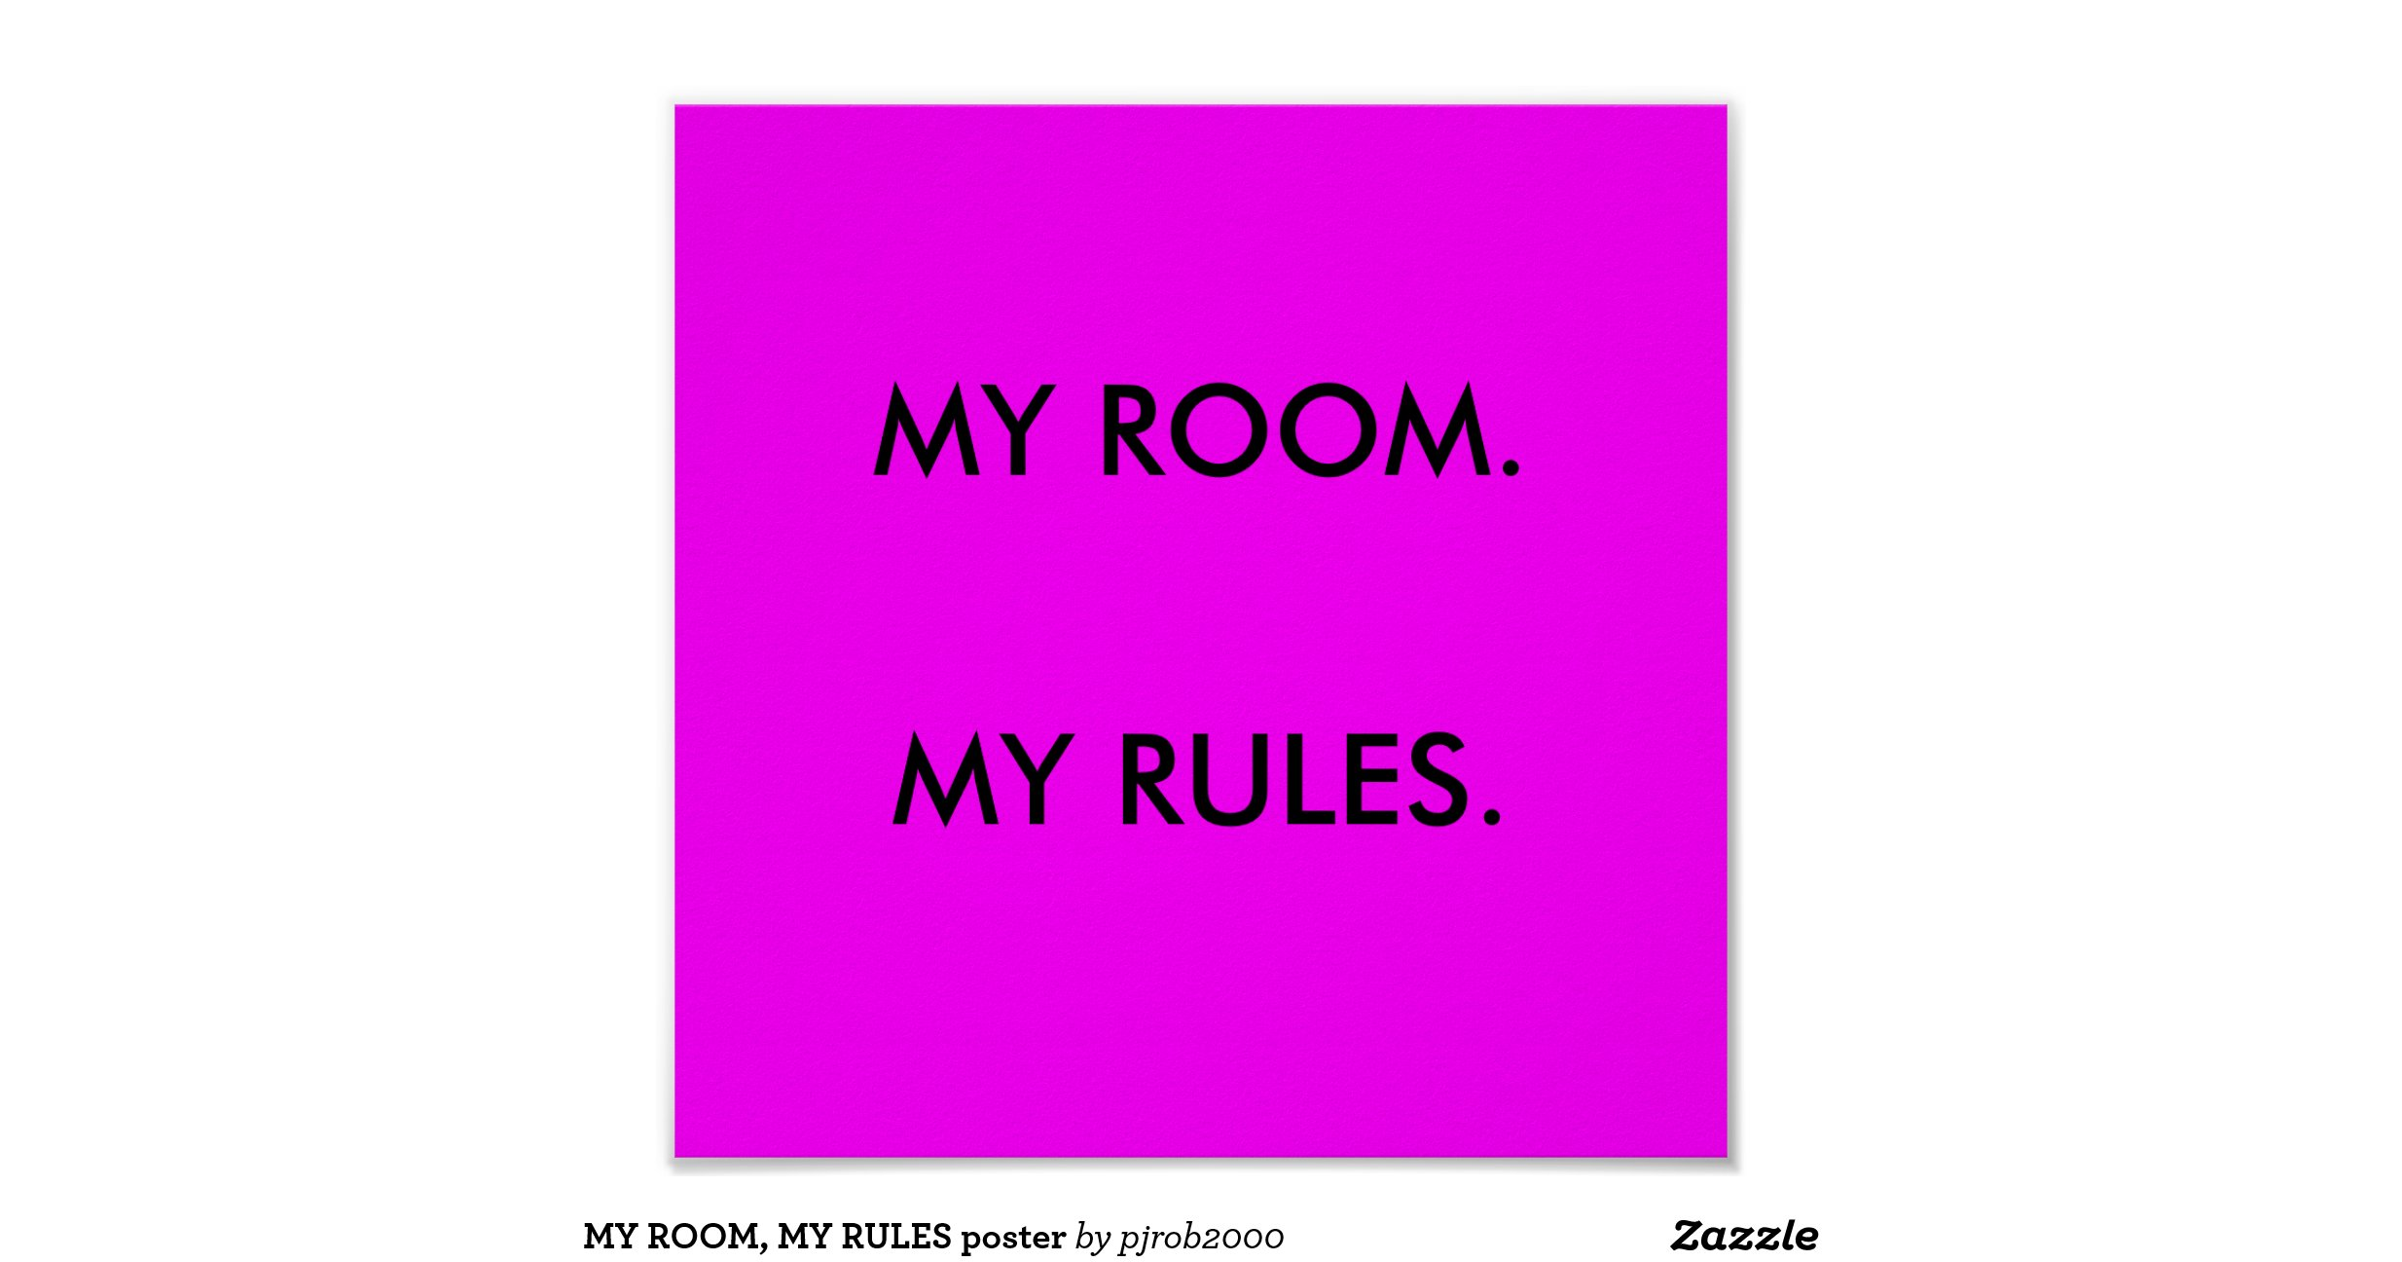 My Room My Rules Poster Rbe9897f3187d4a7398fb9379e692f8d5